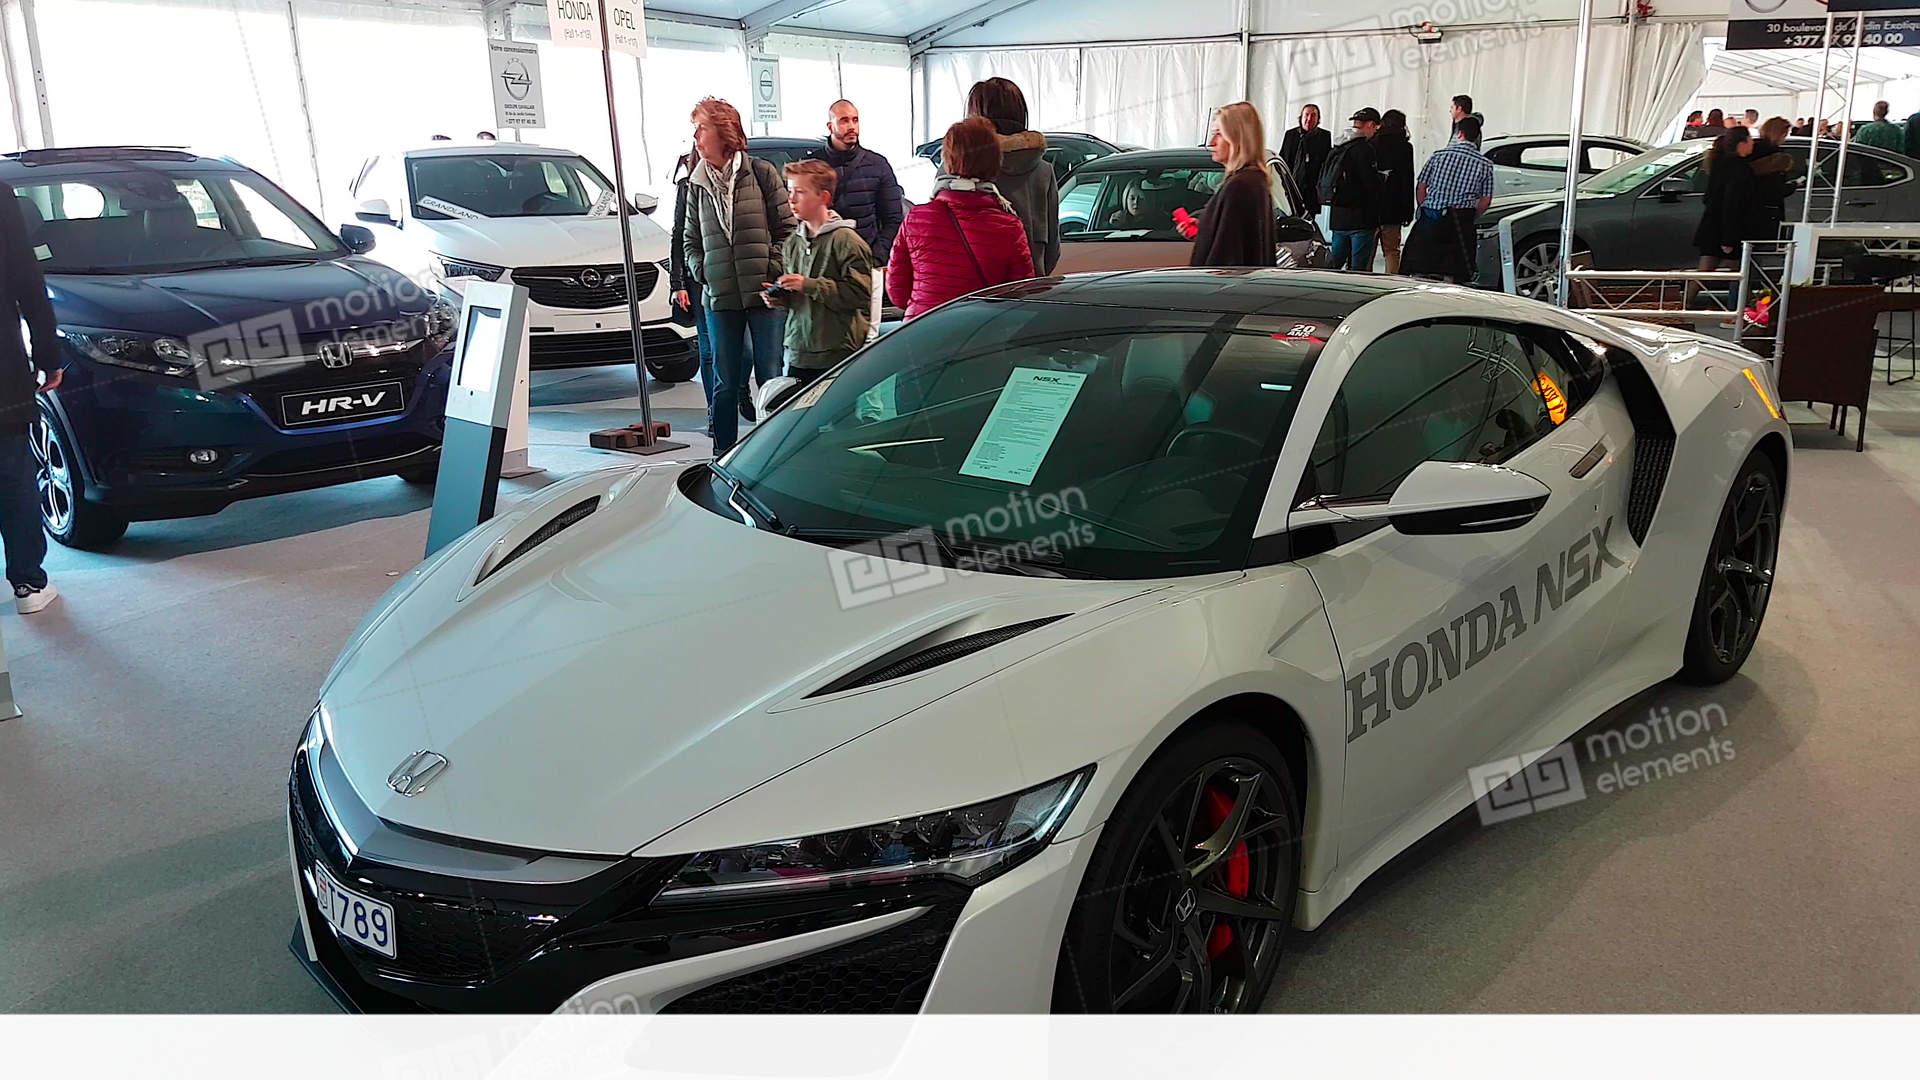 New Honda Nsx Sports Hybrid Car Stock Video Footage